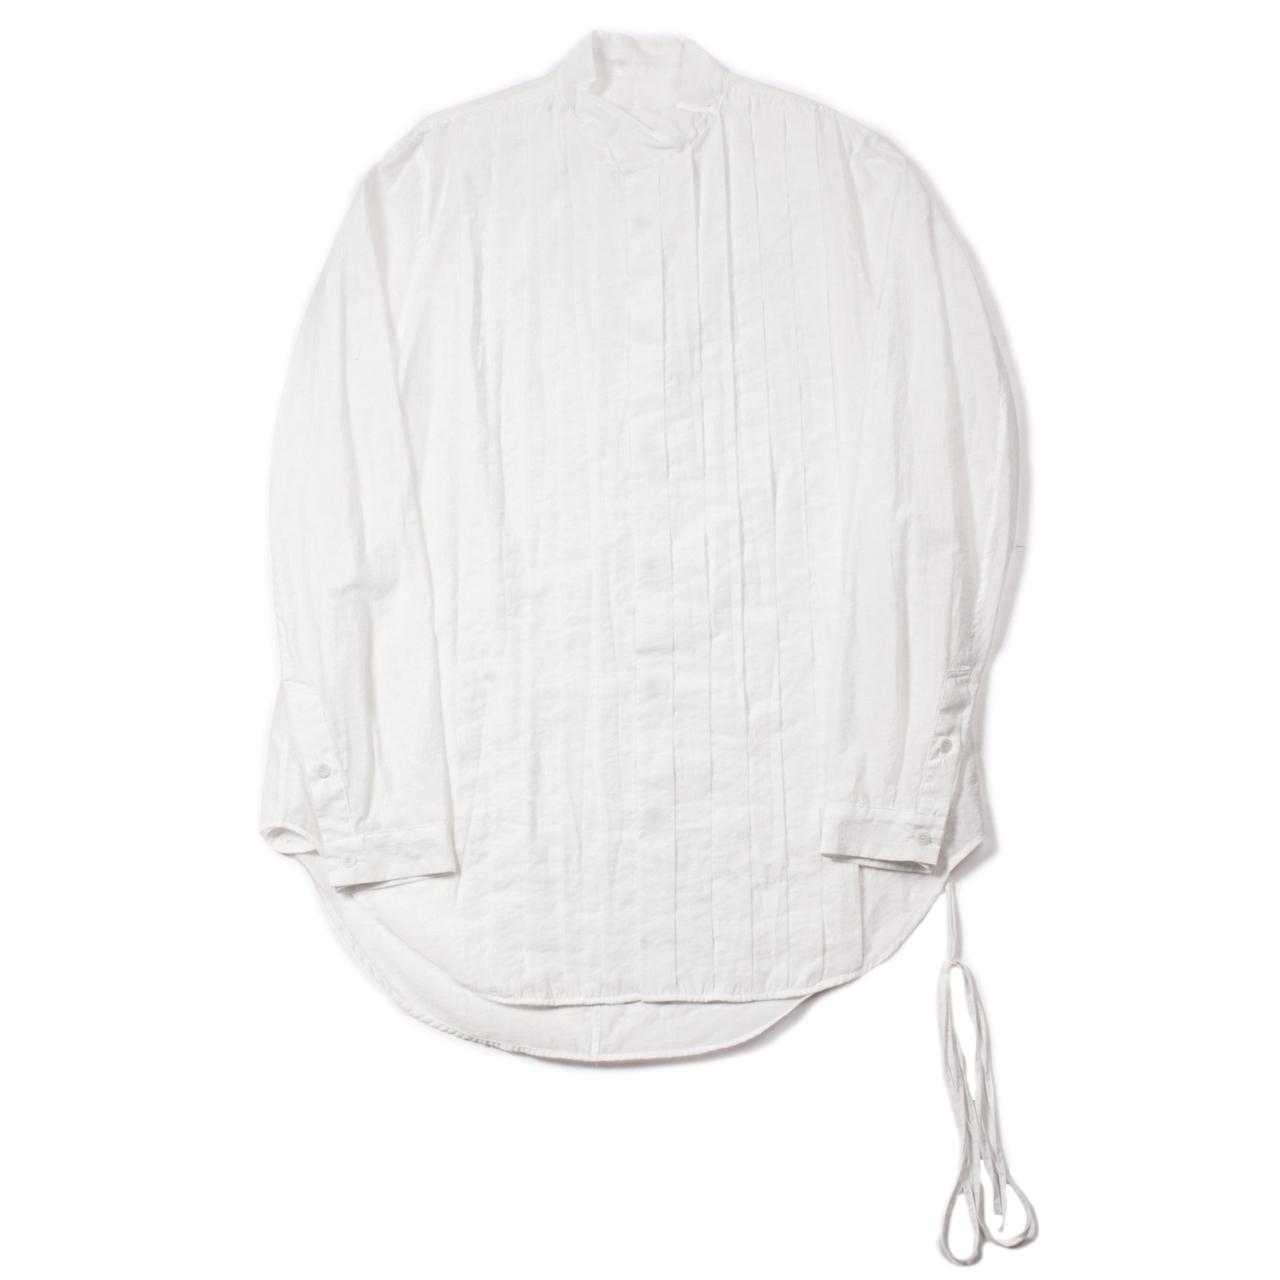 717SHM1-OFF WHITE / プリーツスタンドカラーシャツ